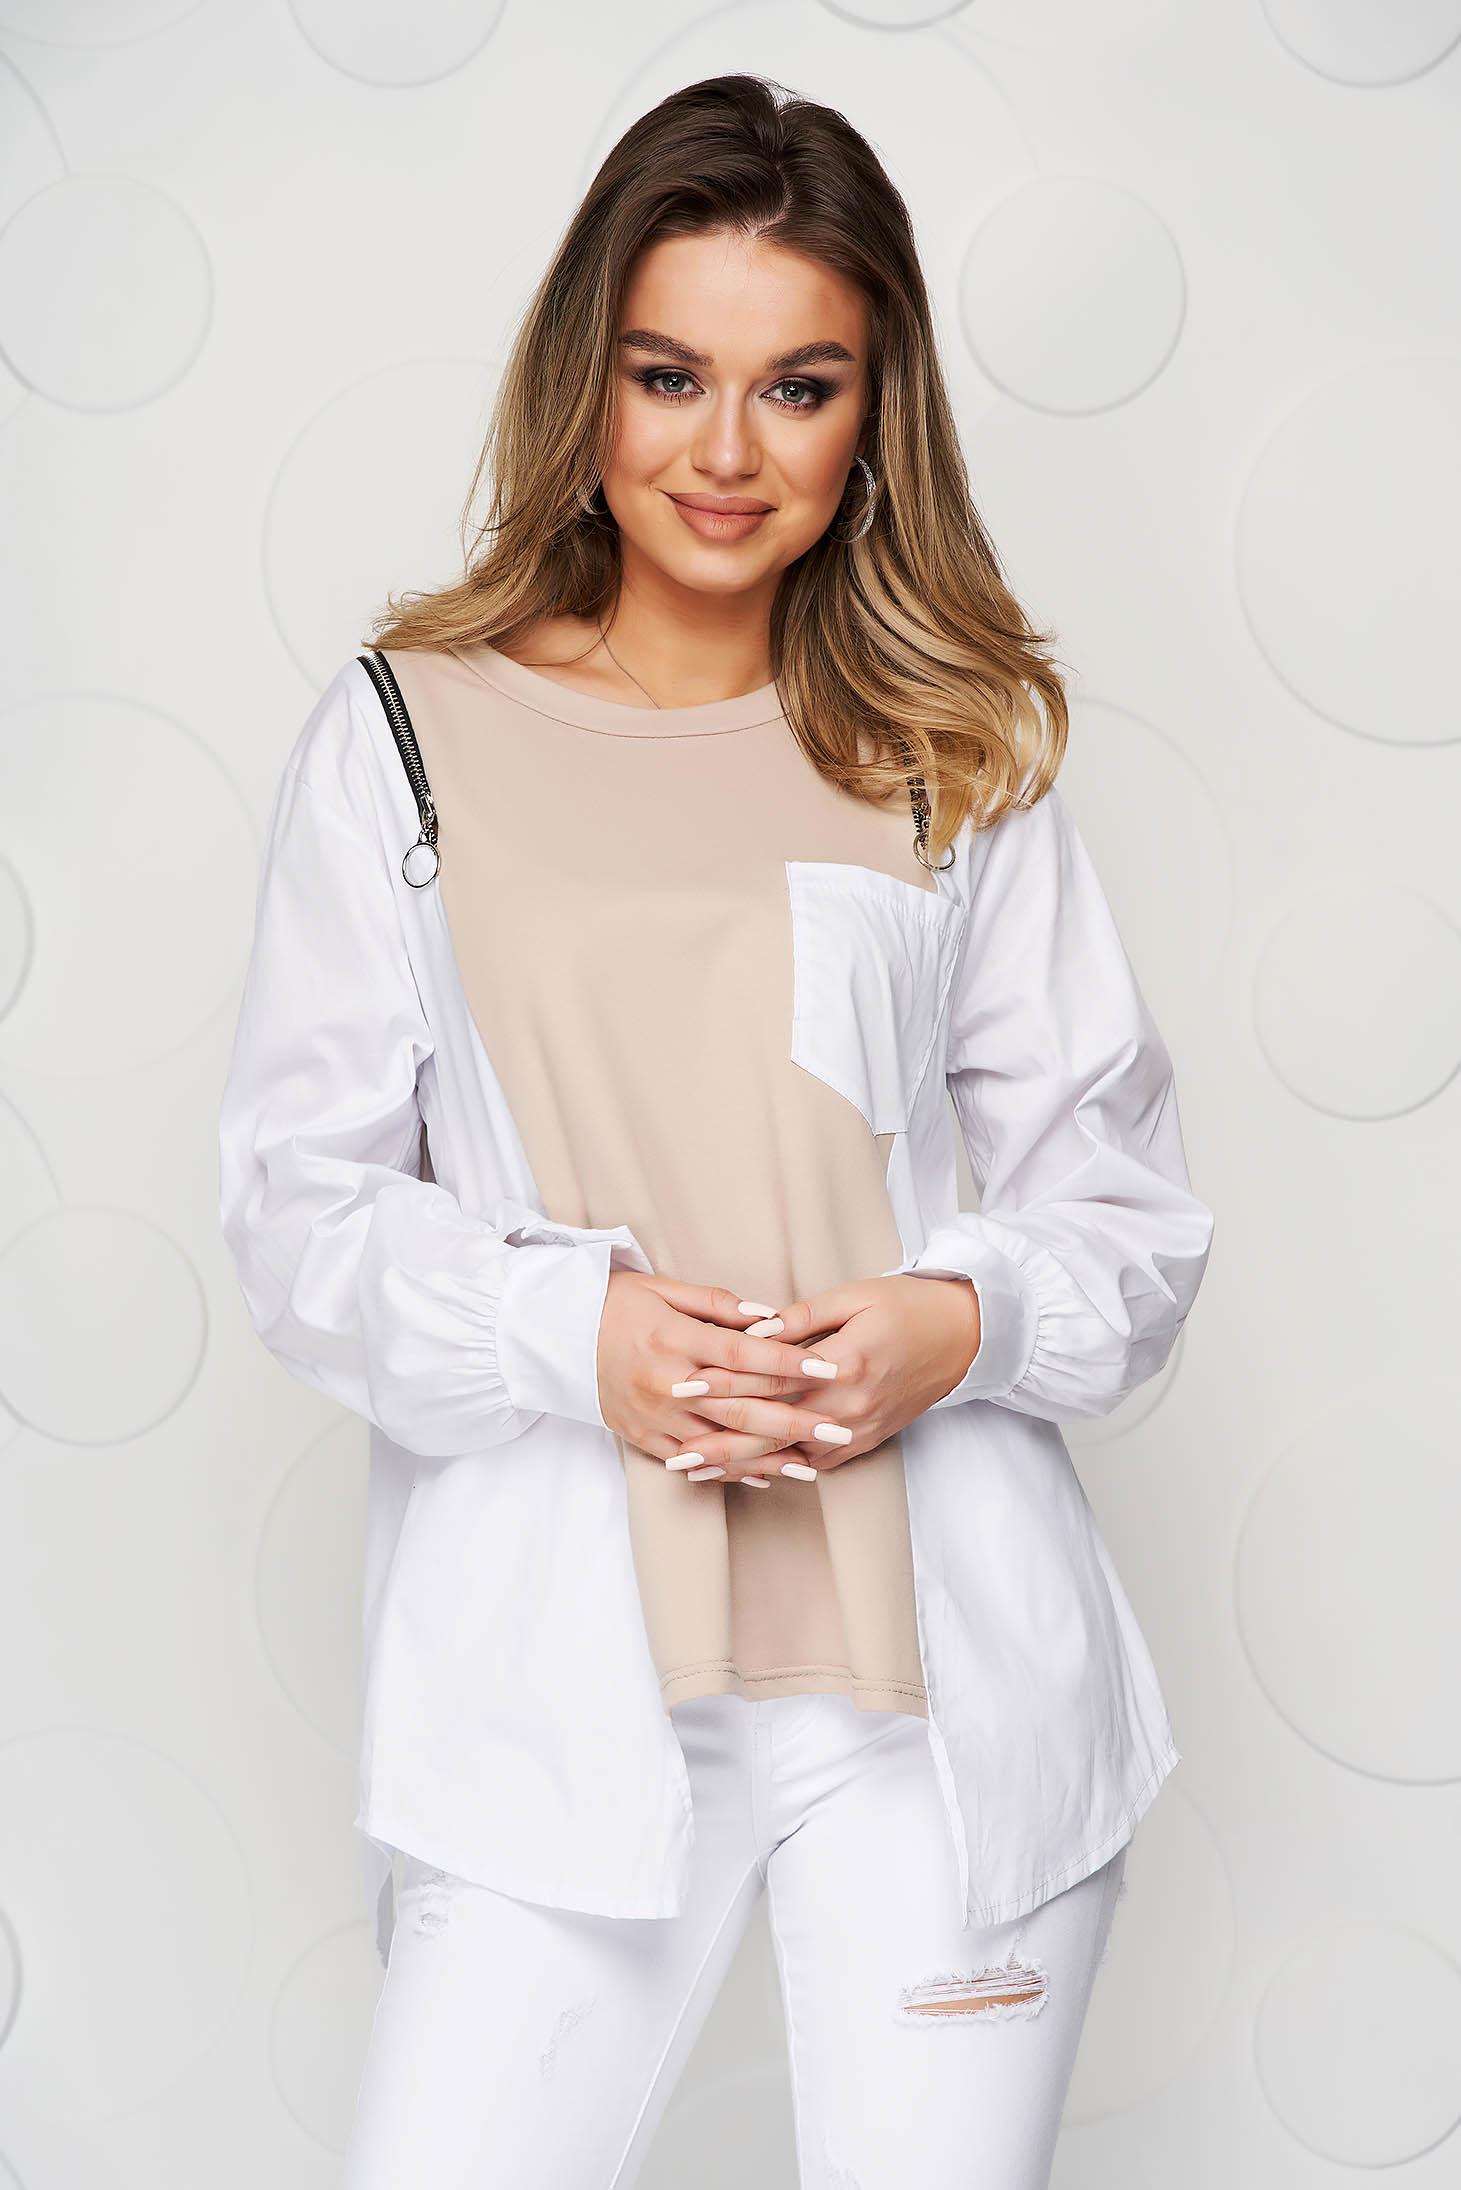 Bluza dama SunShine crem din bumbac asimetrica cu croi larg accesorizata cu fermoare